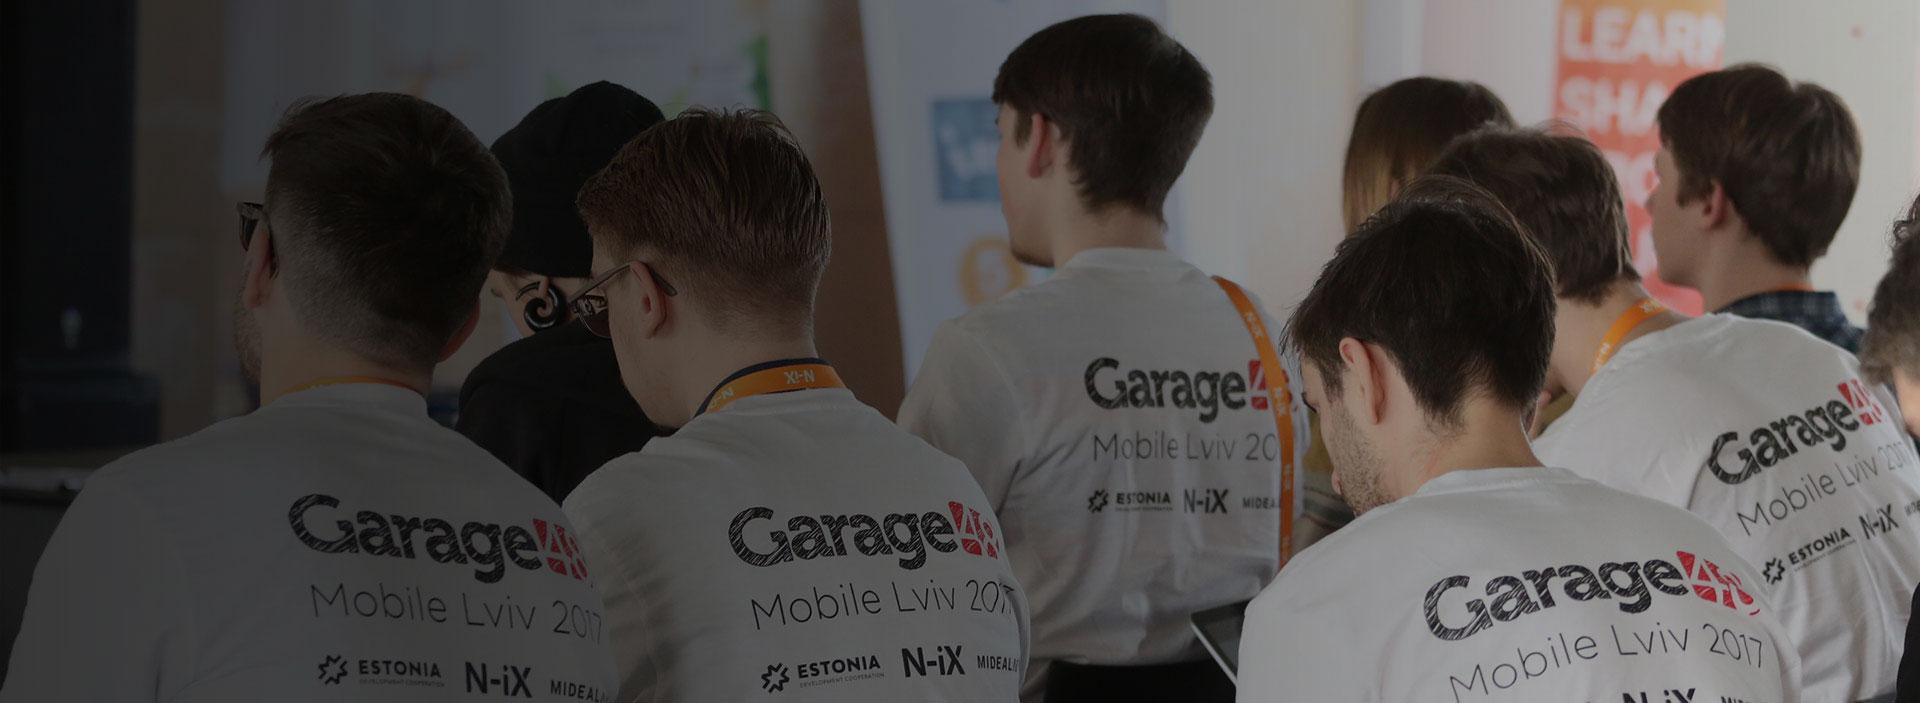 Garage48 Mobile Hackathon at N-iX: Build & Fund a Startup in 48 Hours